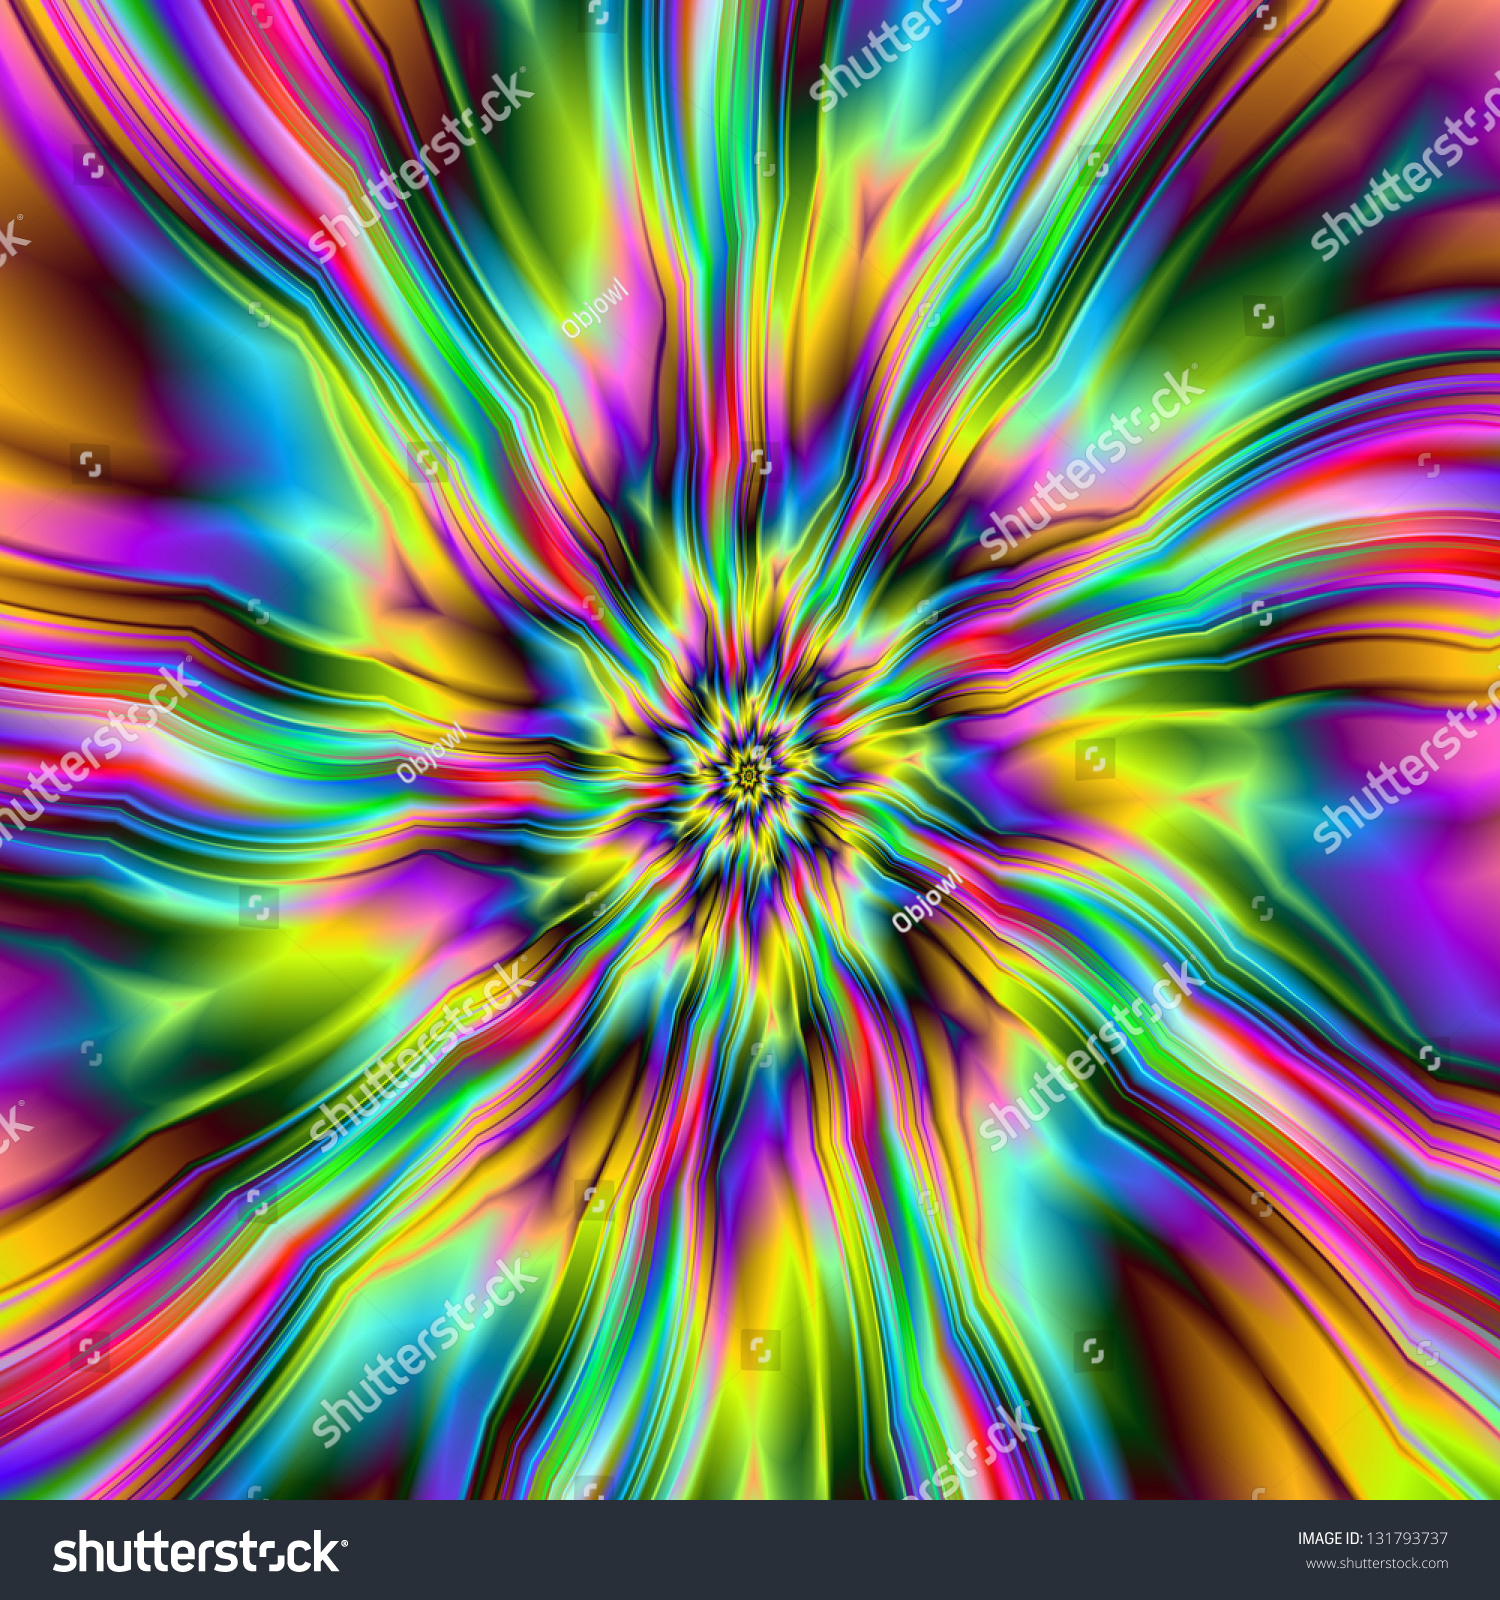 Psychedelic Supernova Digital Abstract Fractal Image Stock ...